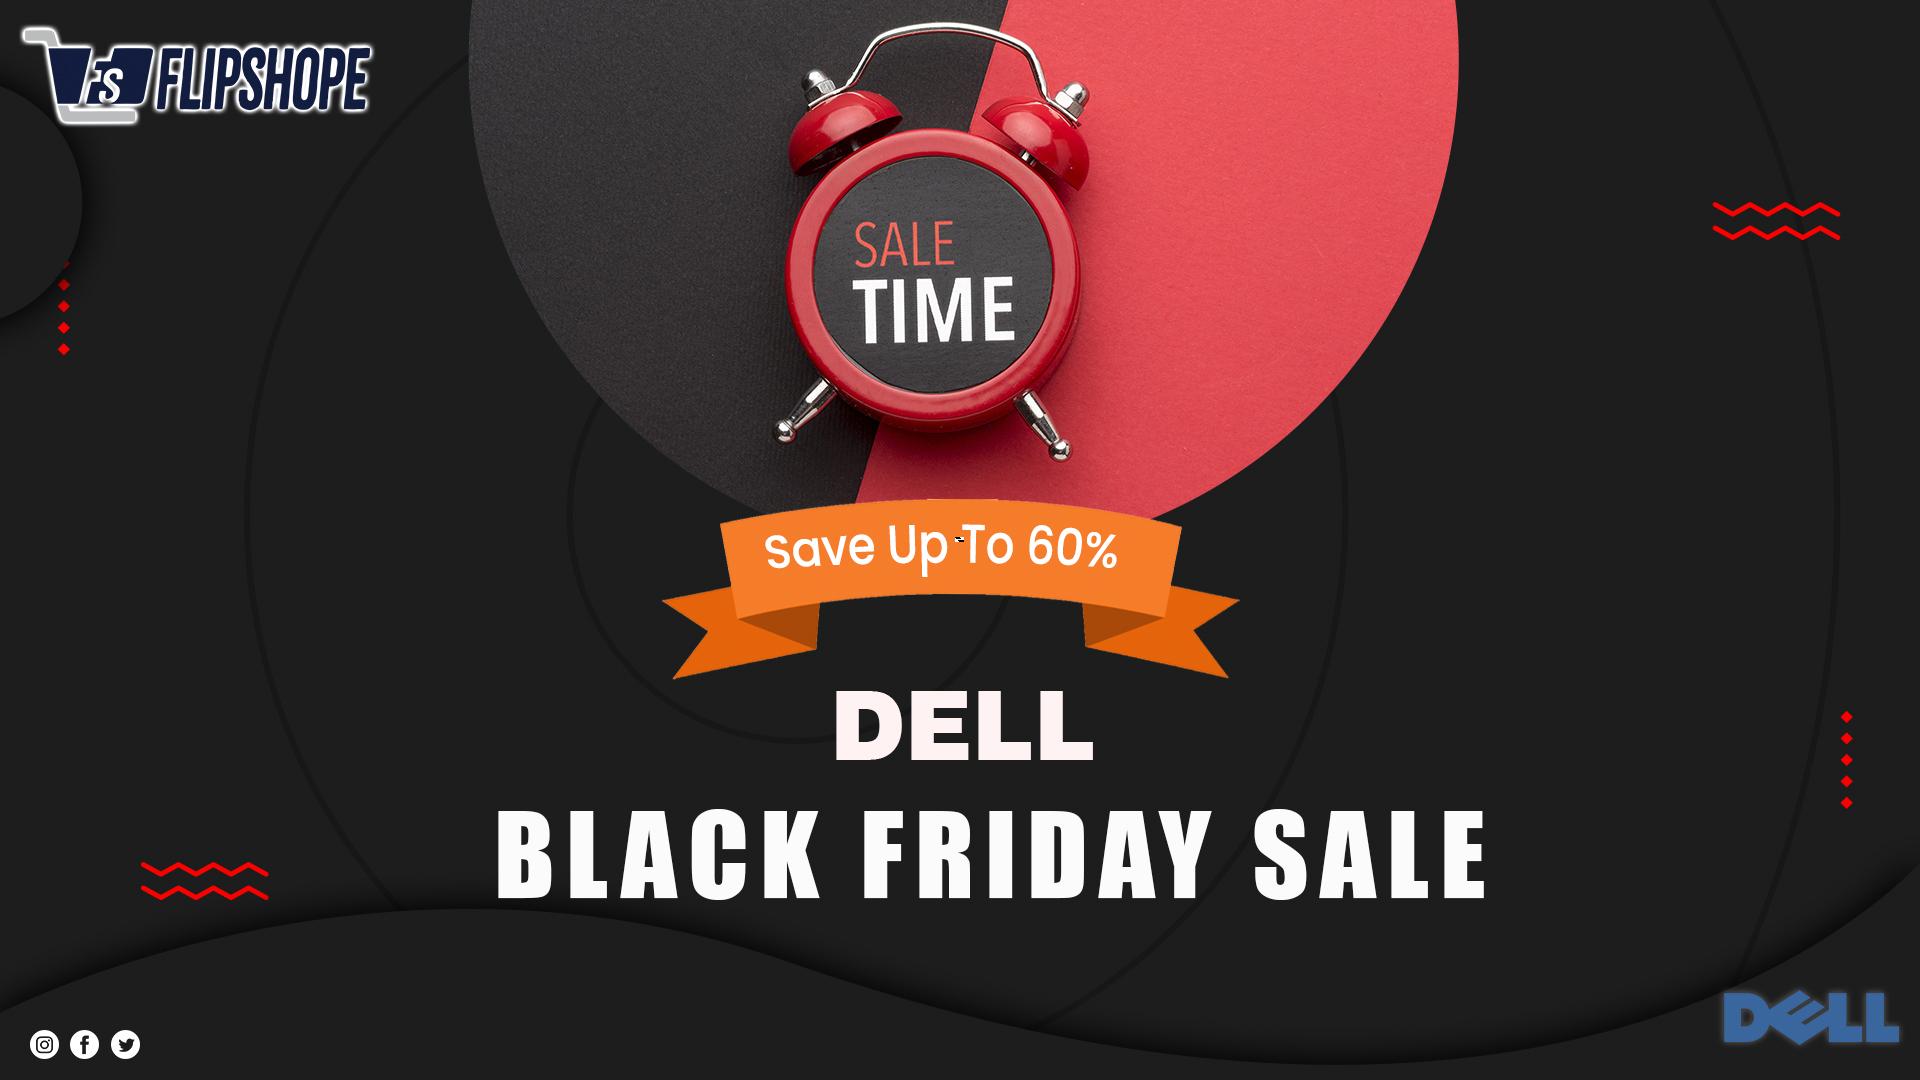 Dell black friday sale 2021